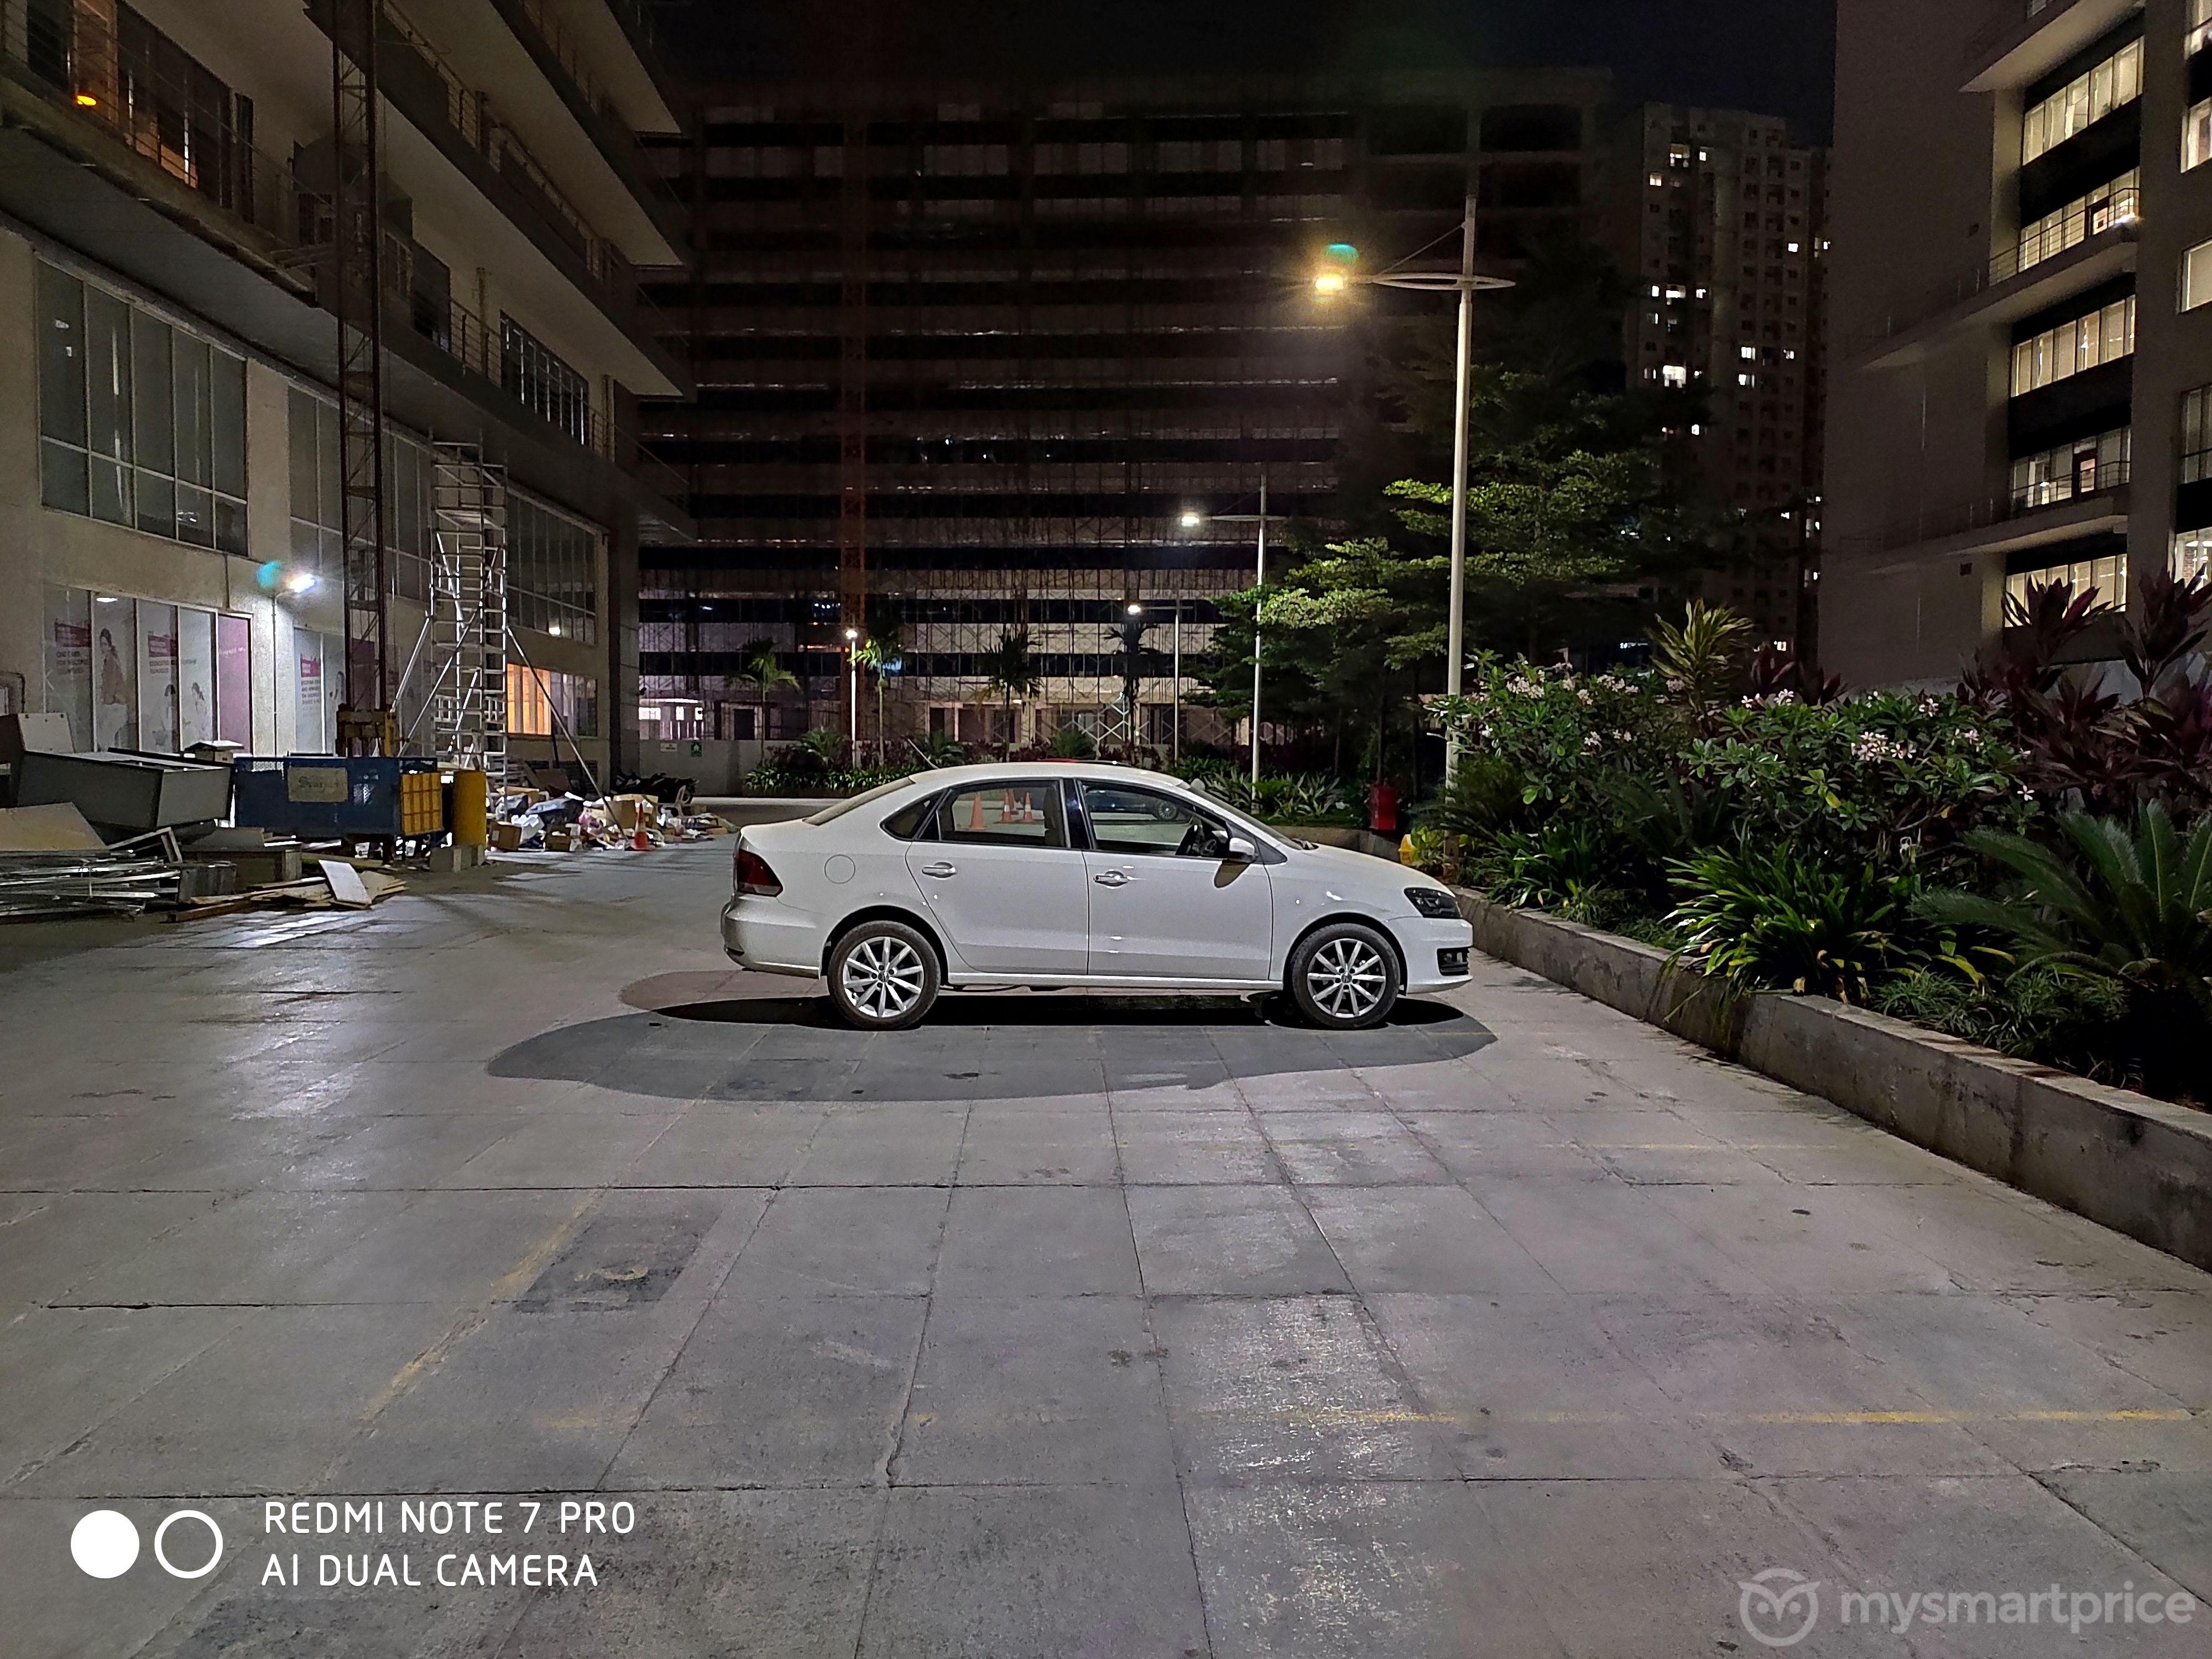 Xiaomi Redmi Note 7 Pro Lowlight Camera Sample 26 (Night Mode)